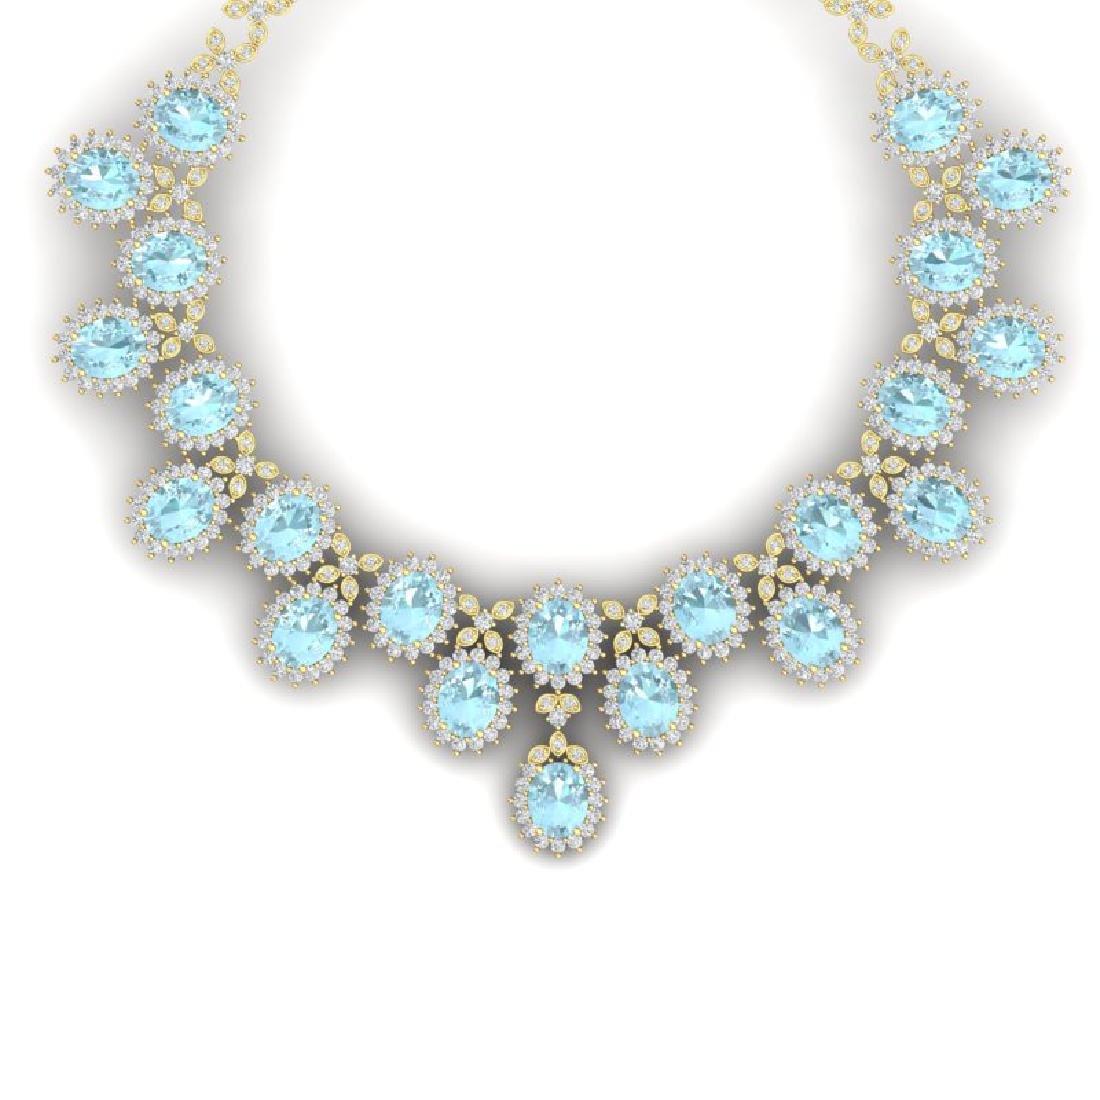 83 CTW Royalty Sky Topaz & VS Diamond Necklace 18K